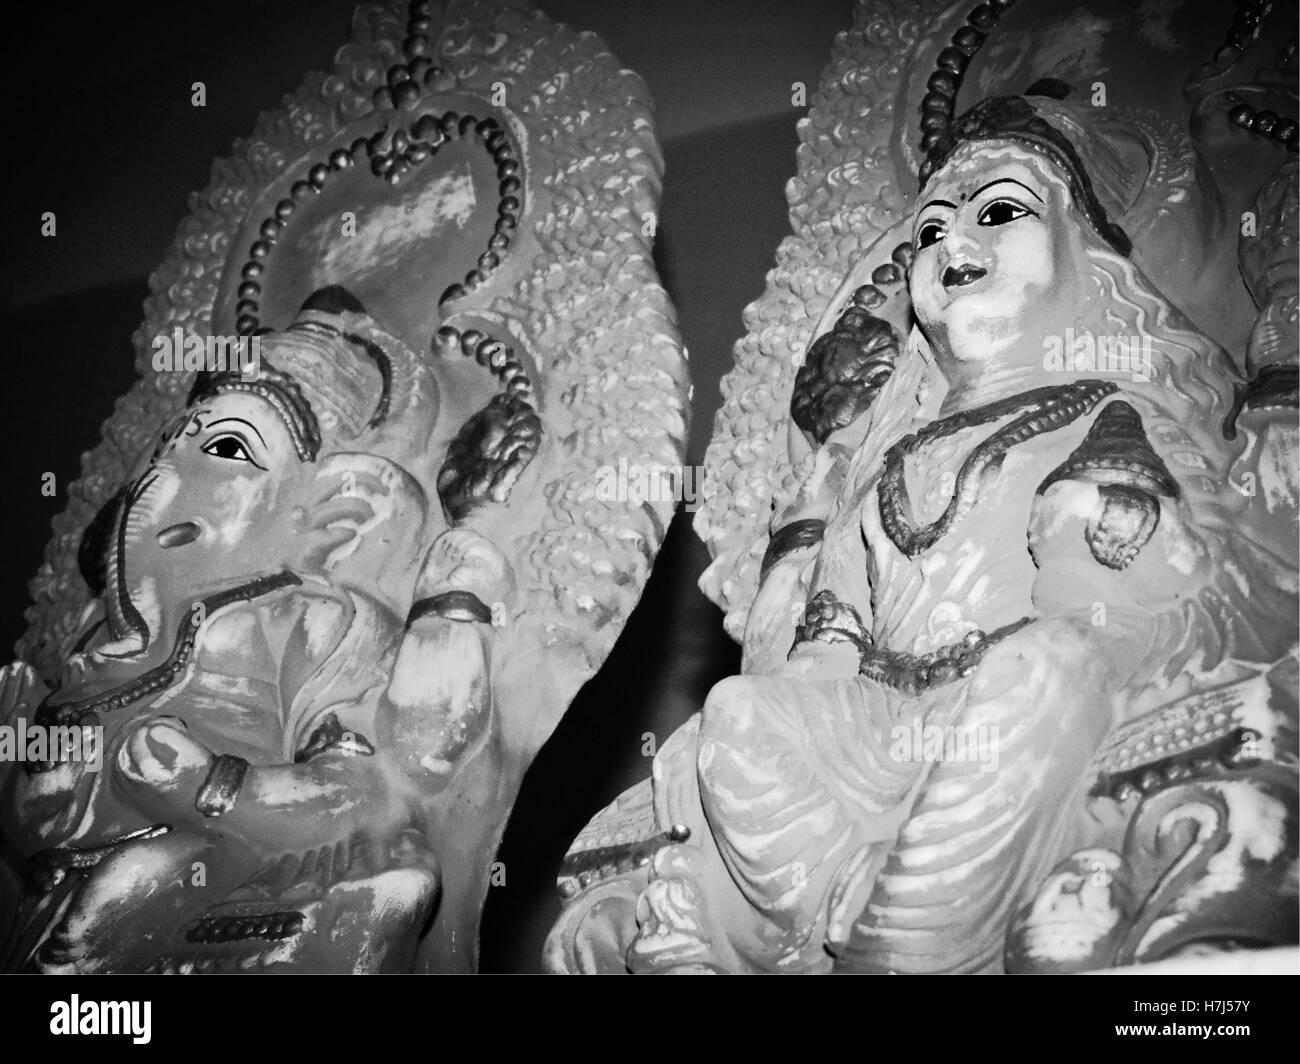 Hindu Deities - Lord Ganesha and Goddess Laksmi - Stock Image